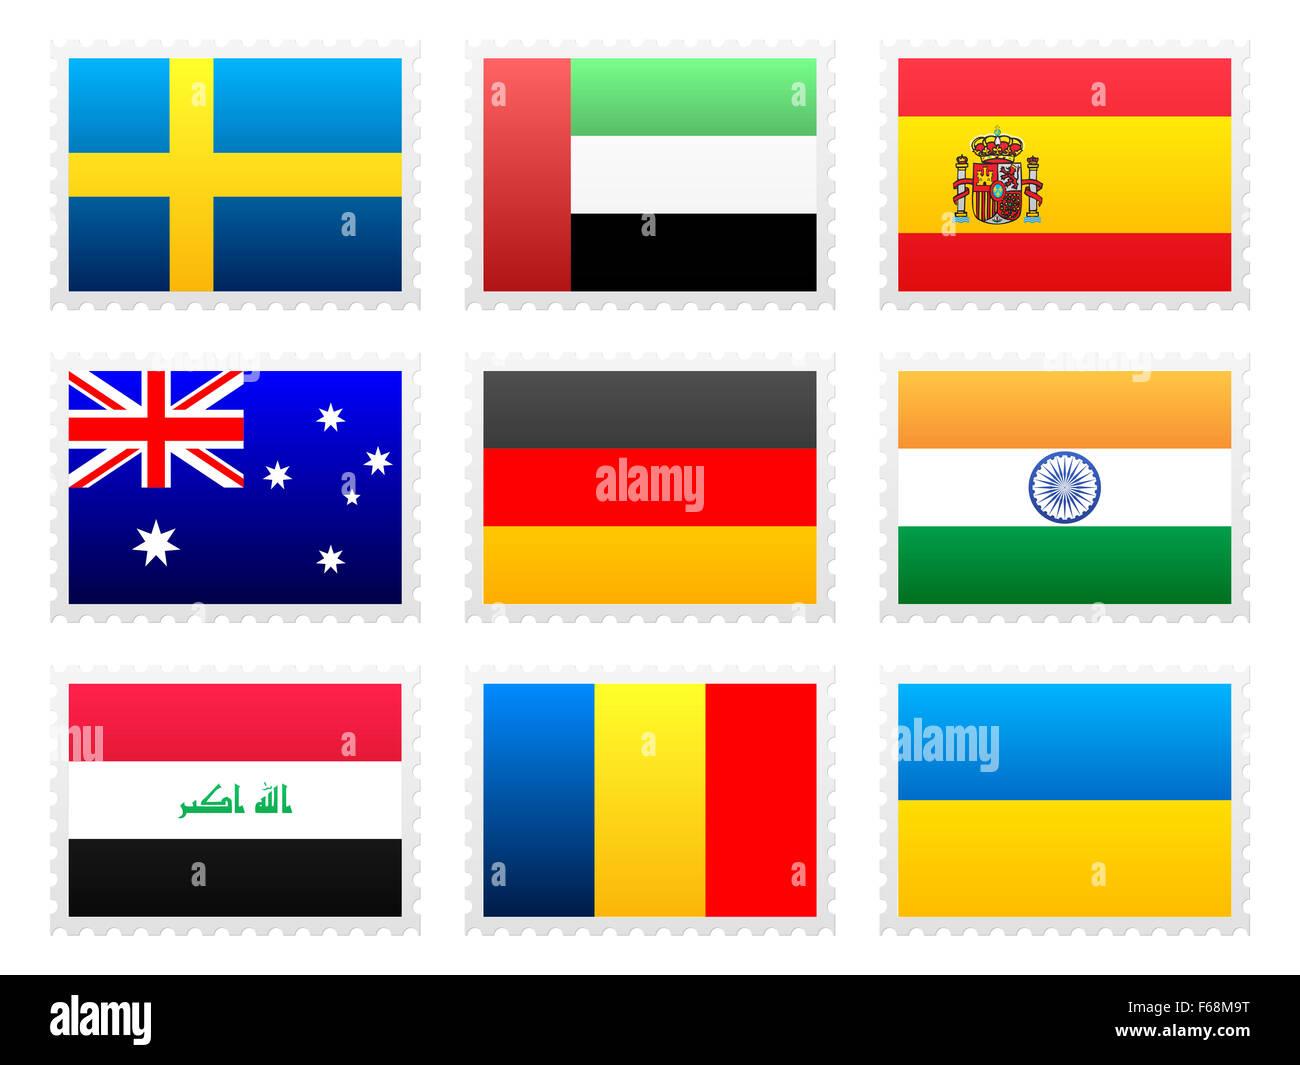 National flag set on a white background. - Stock Image